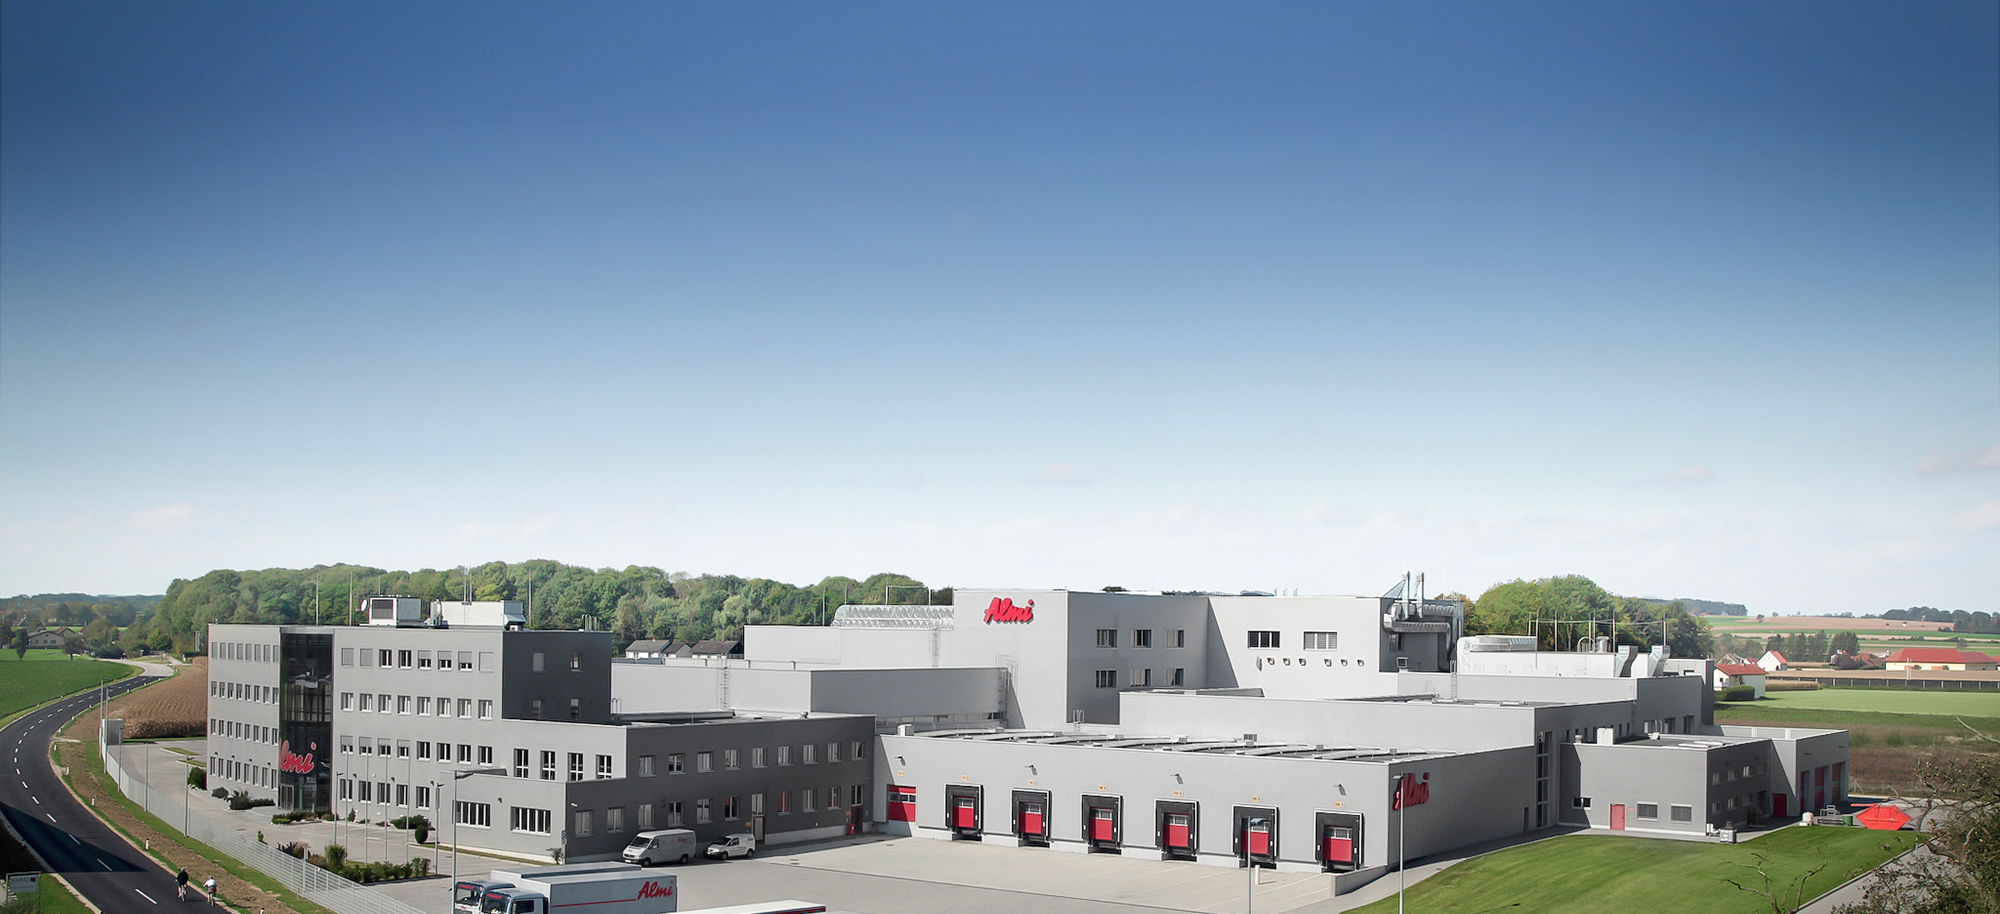 Almi - Unternehmen - Вкус и<br>ноу-хау <strong>за<br>хранително-вкусовата промишленост.</strong>